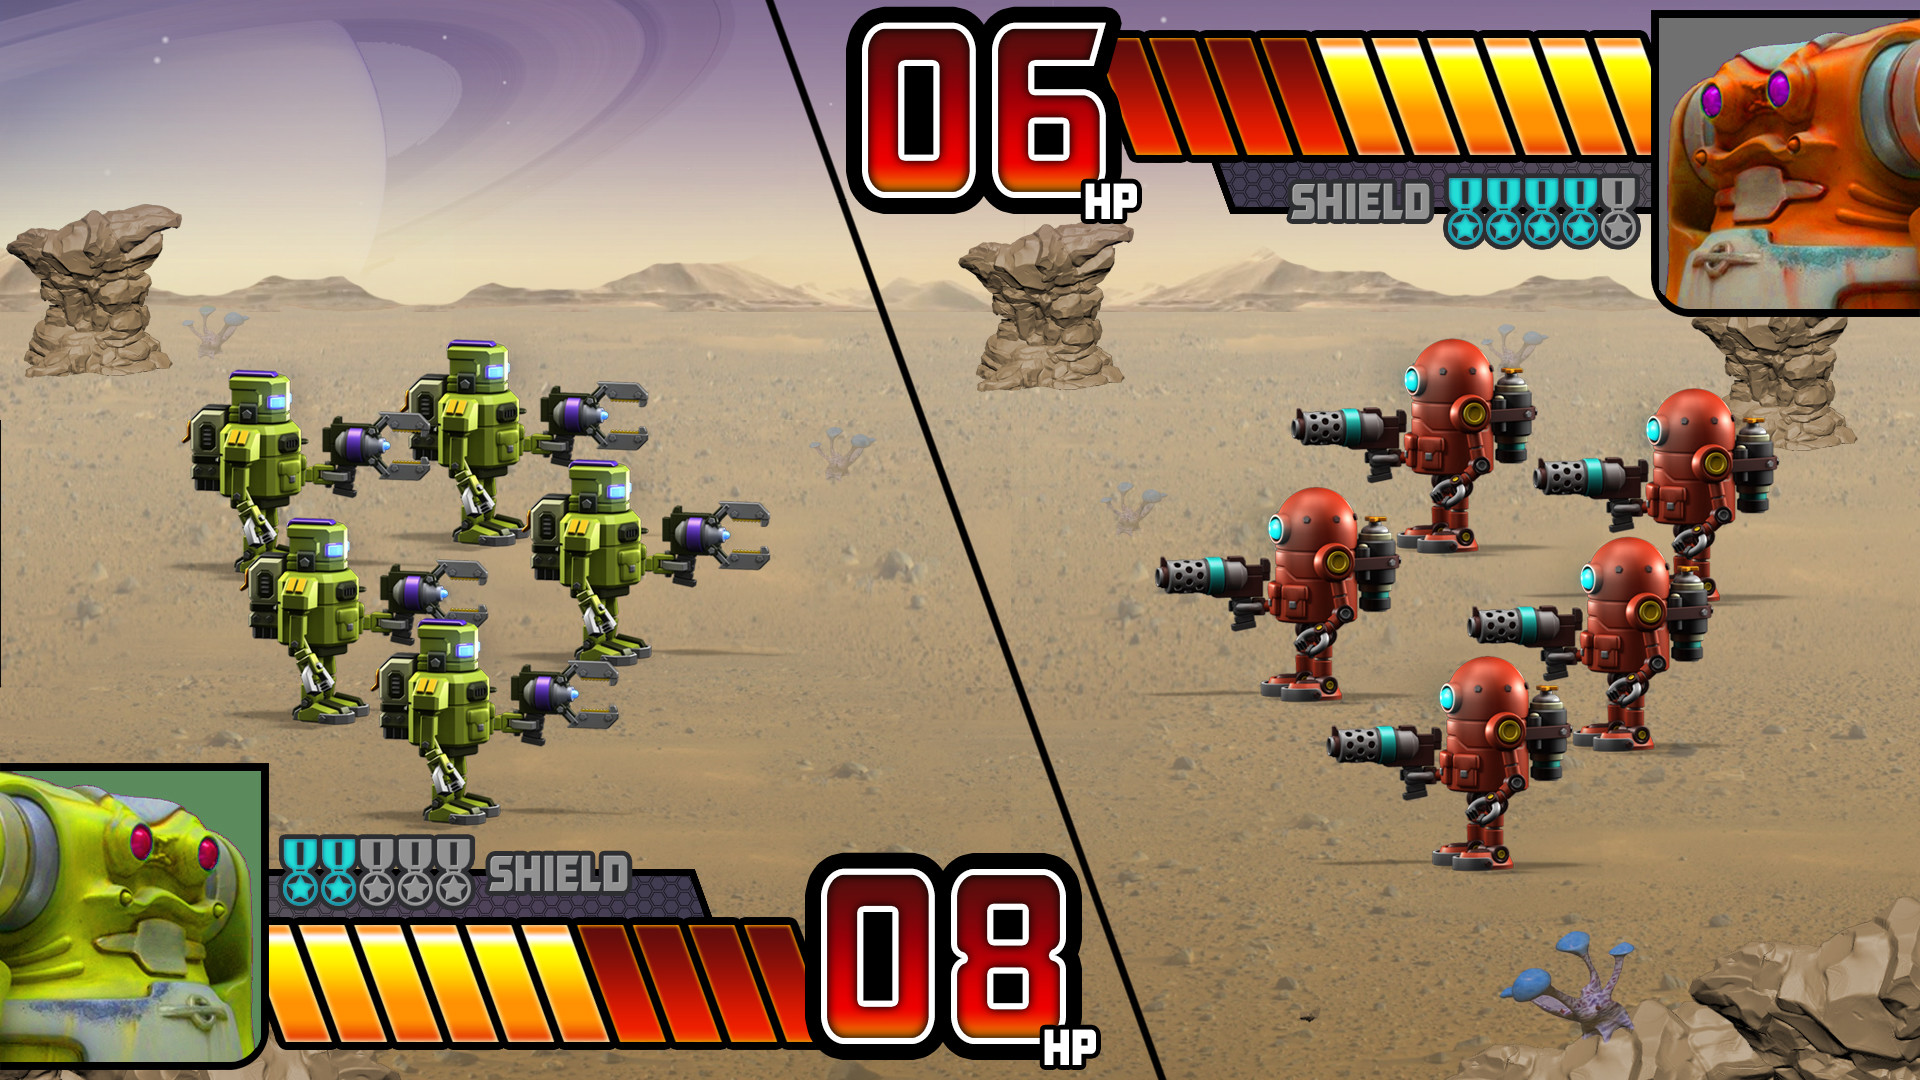 Mock up gameplay screen